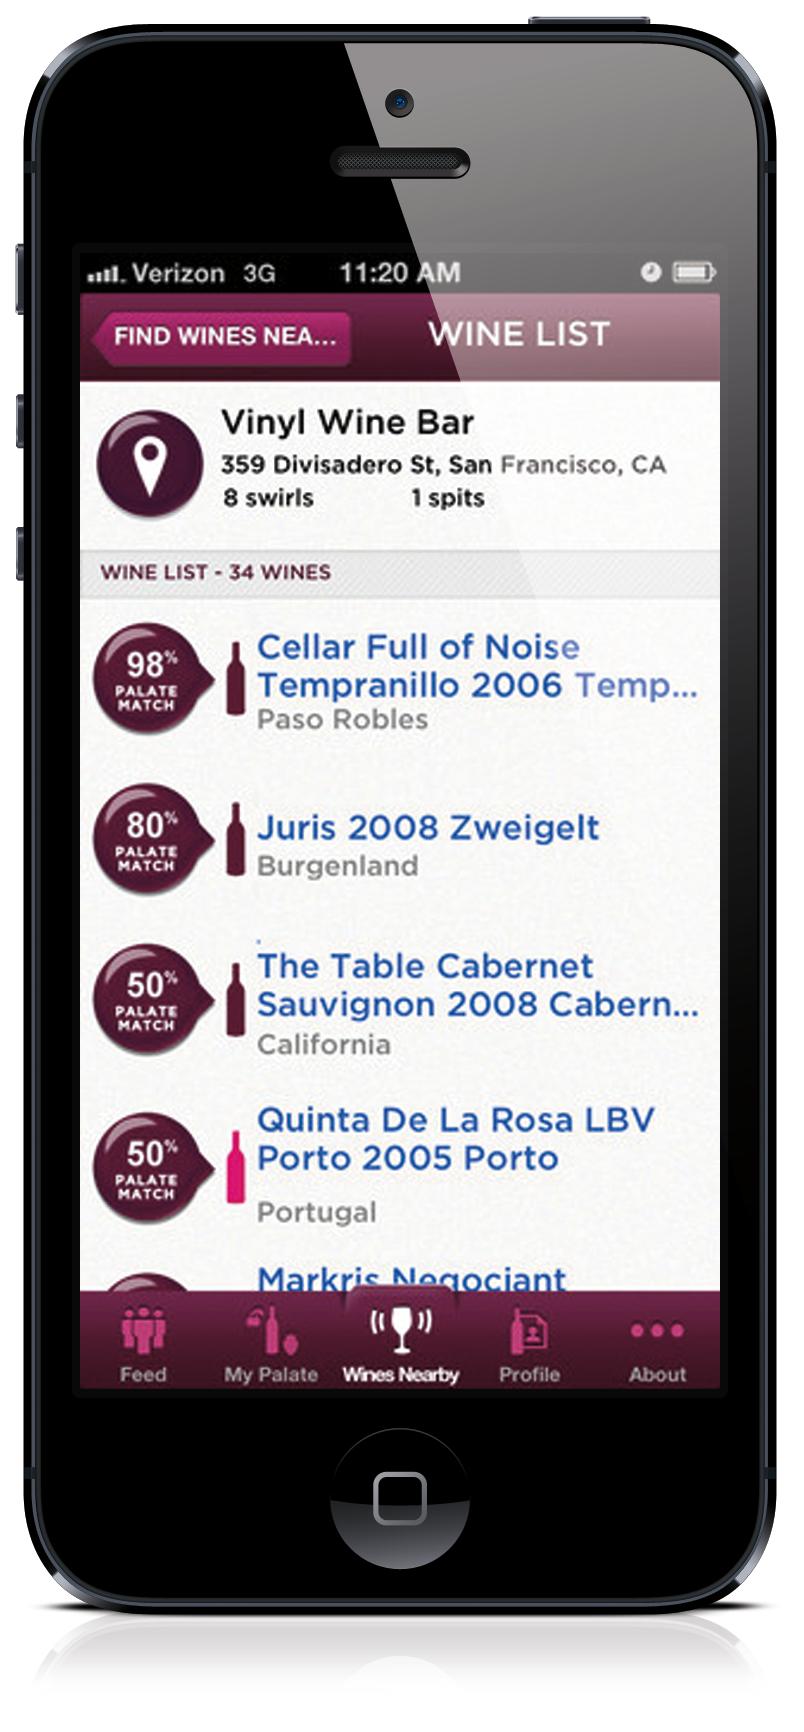 Swirl it! Taste-Based wine Recommendation App - image 2 - student project